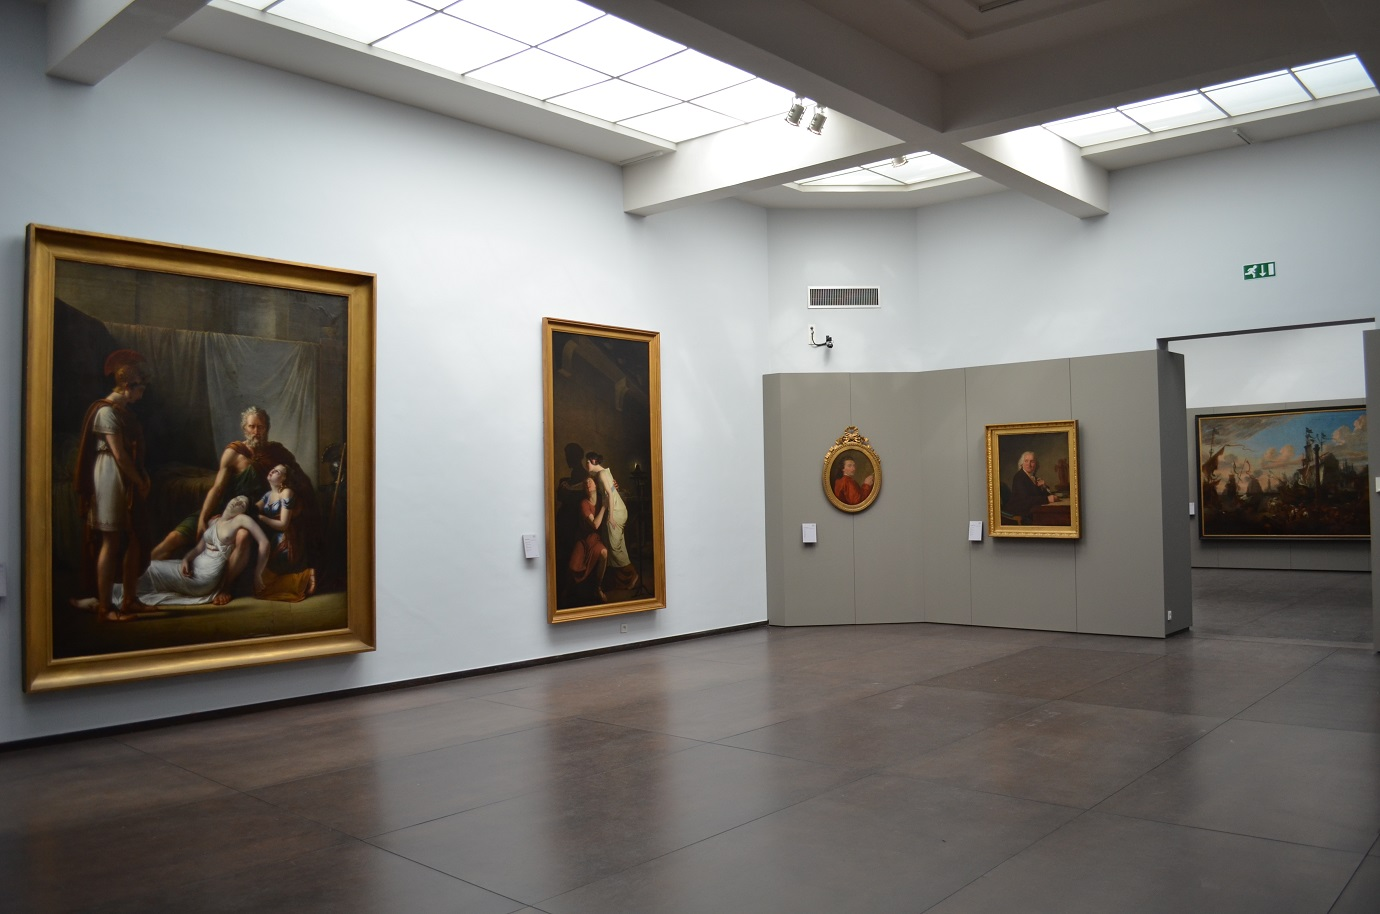 Musea Brugge - Groeningemuseum, Room 6, Neoclassicism in Bruges<br/> © Musea Brugge